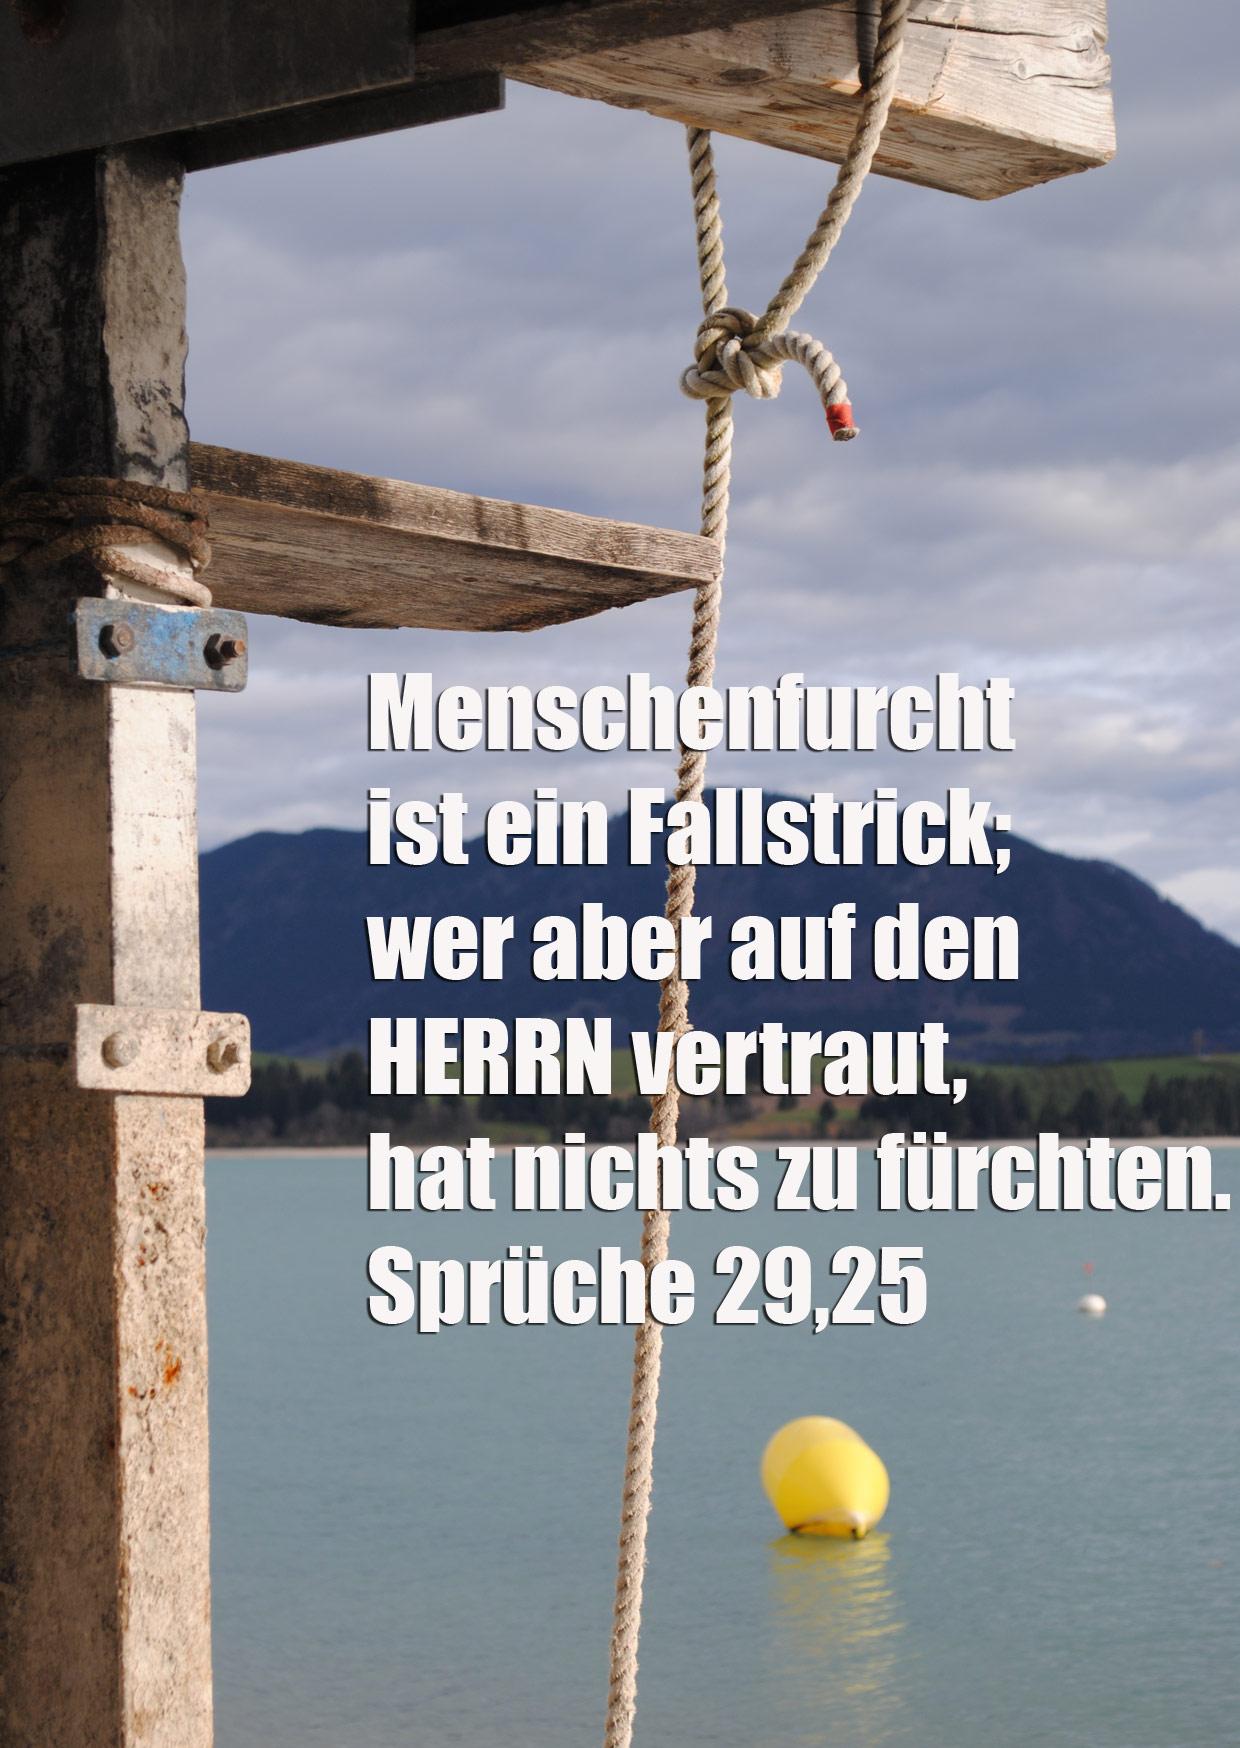 Bibelzitat, Sprüche 29,5, Foto: Danzer, Christine, go 4 Jesus, Bibel